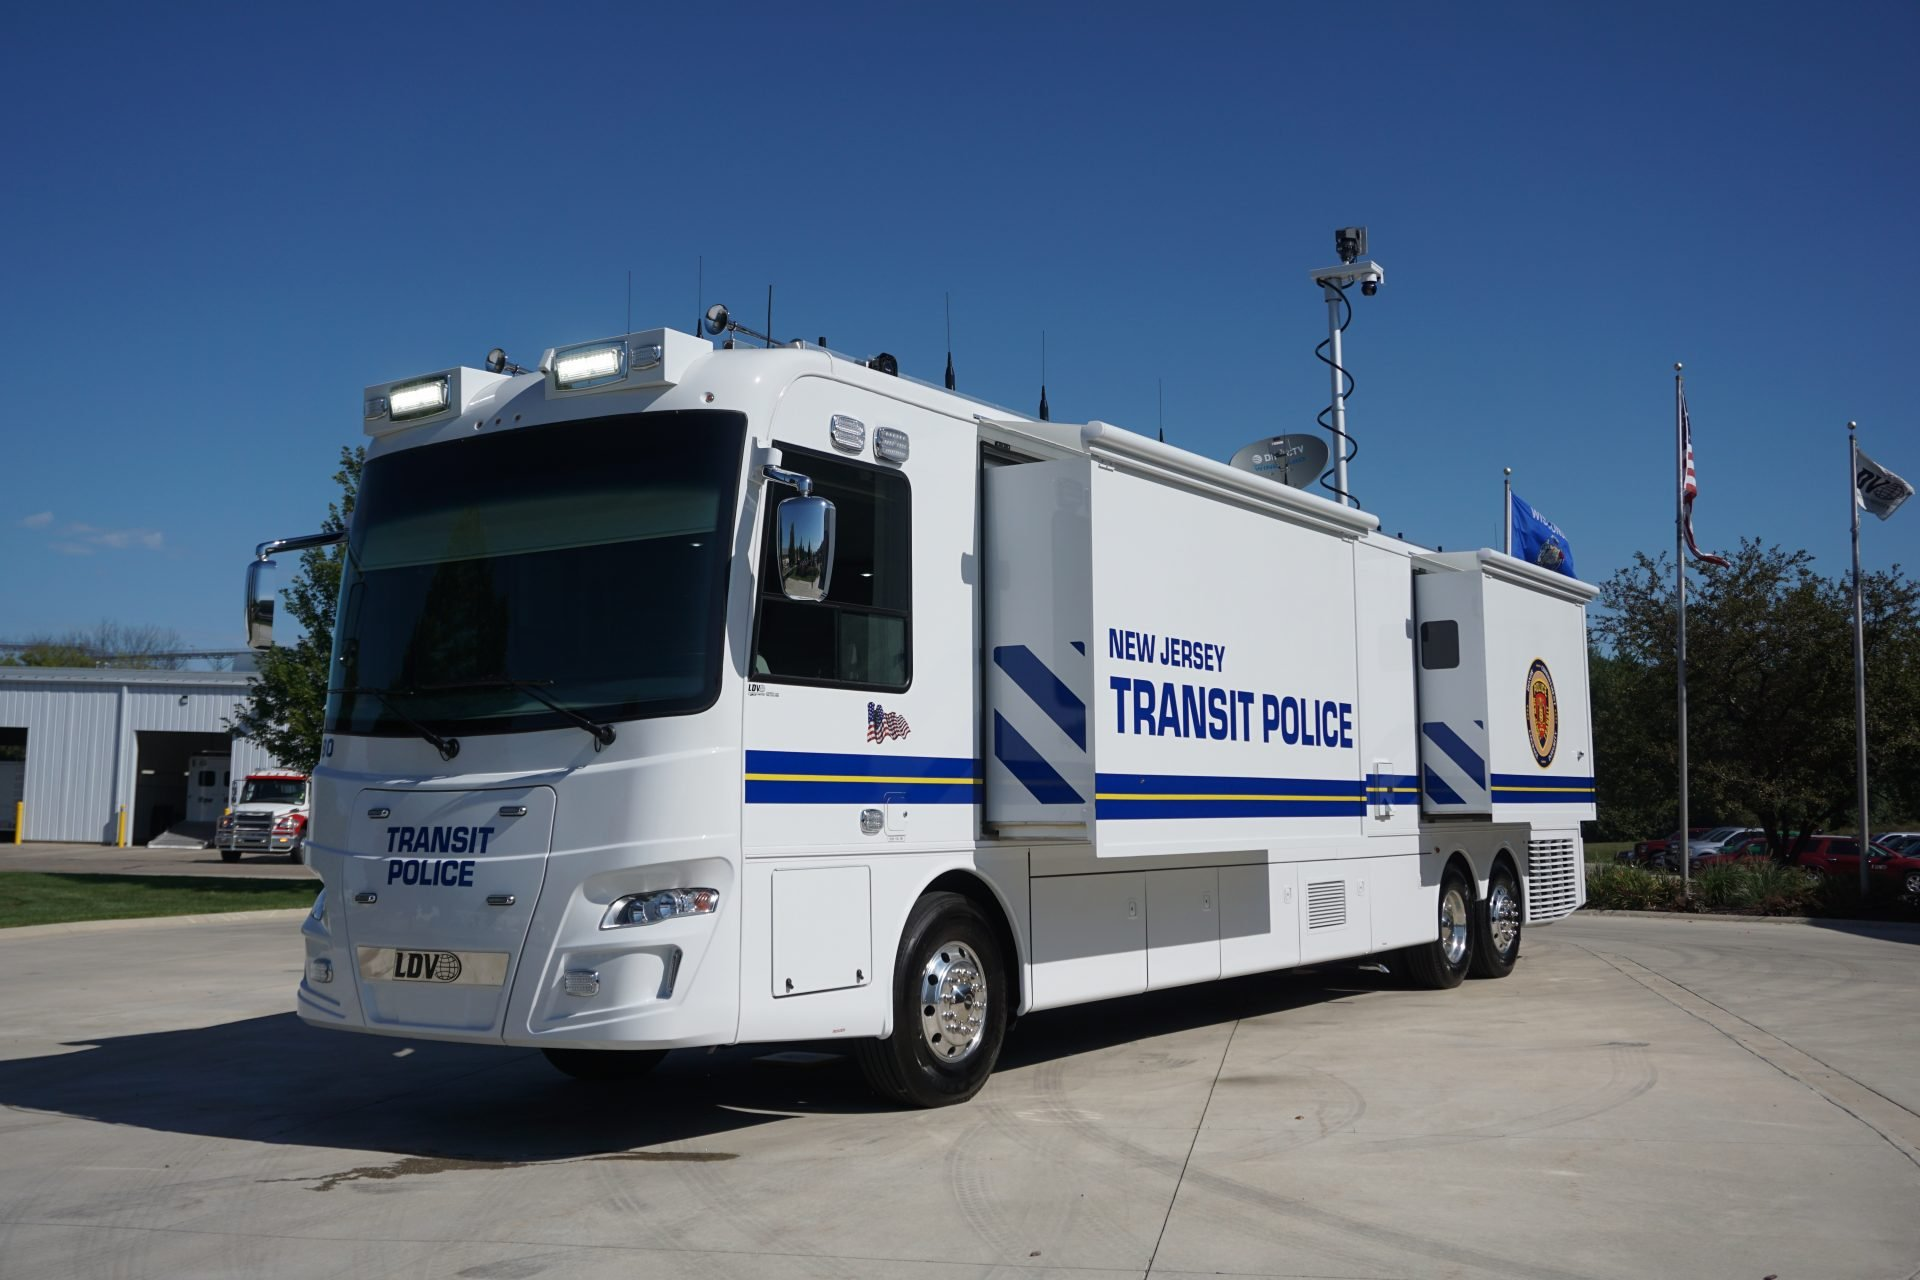 LDV New Jersey Transit Police Mobile Command Center